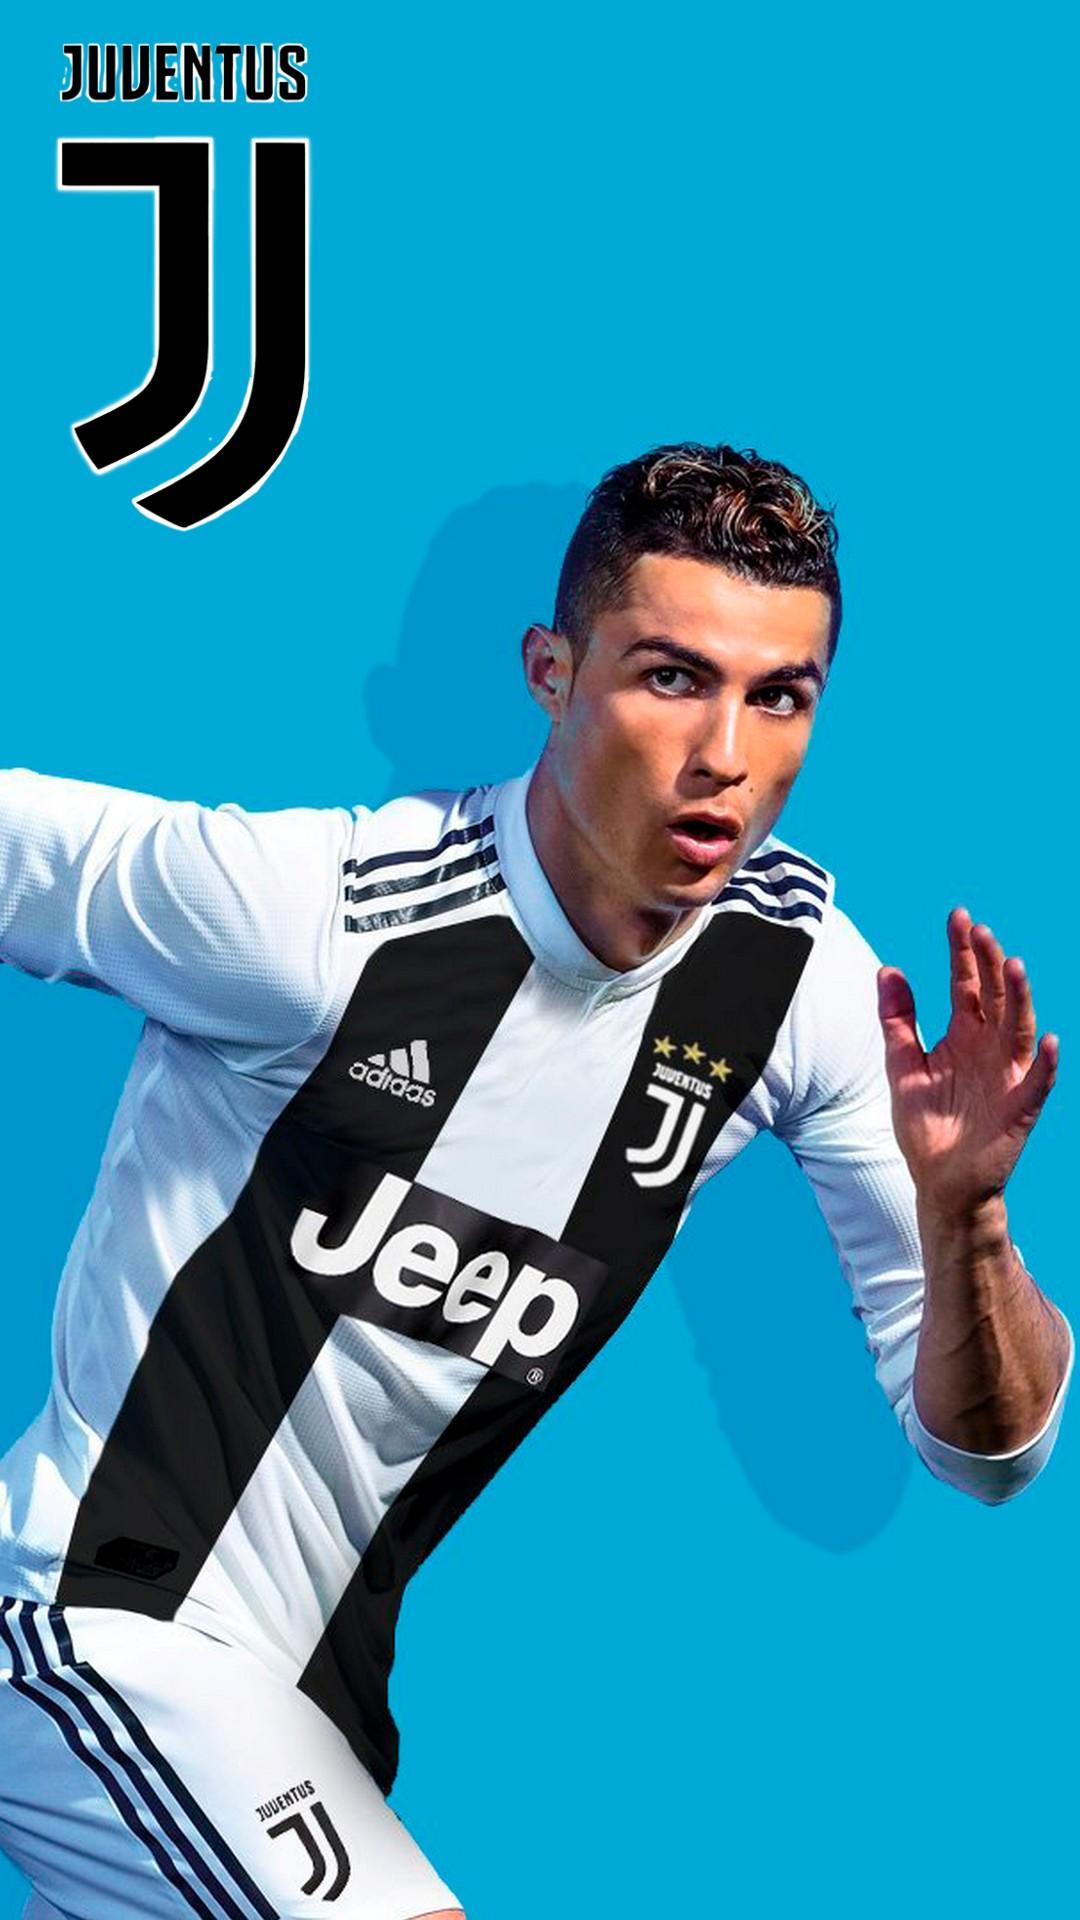 Cristiano Ronaldo Juventus Wallpaper Mobile With Resolution - Ronaldo Juventus Wallpaper Iphone - HD Wallpaper